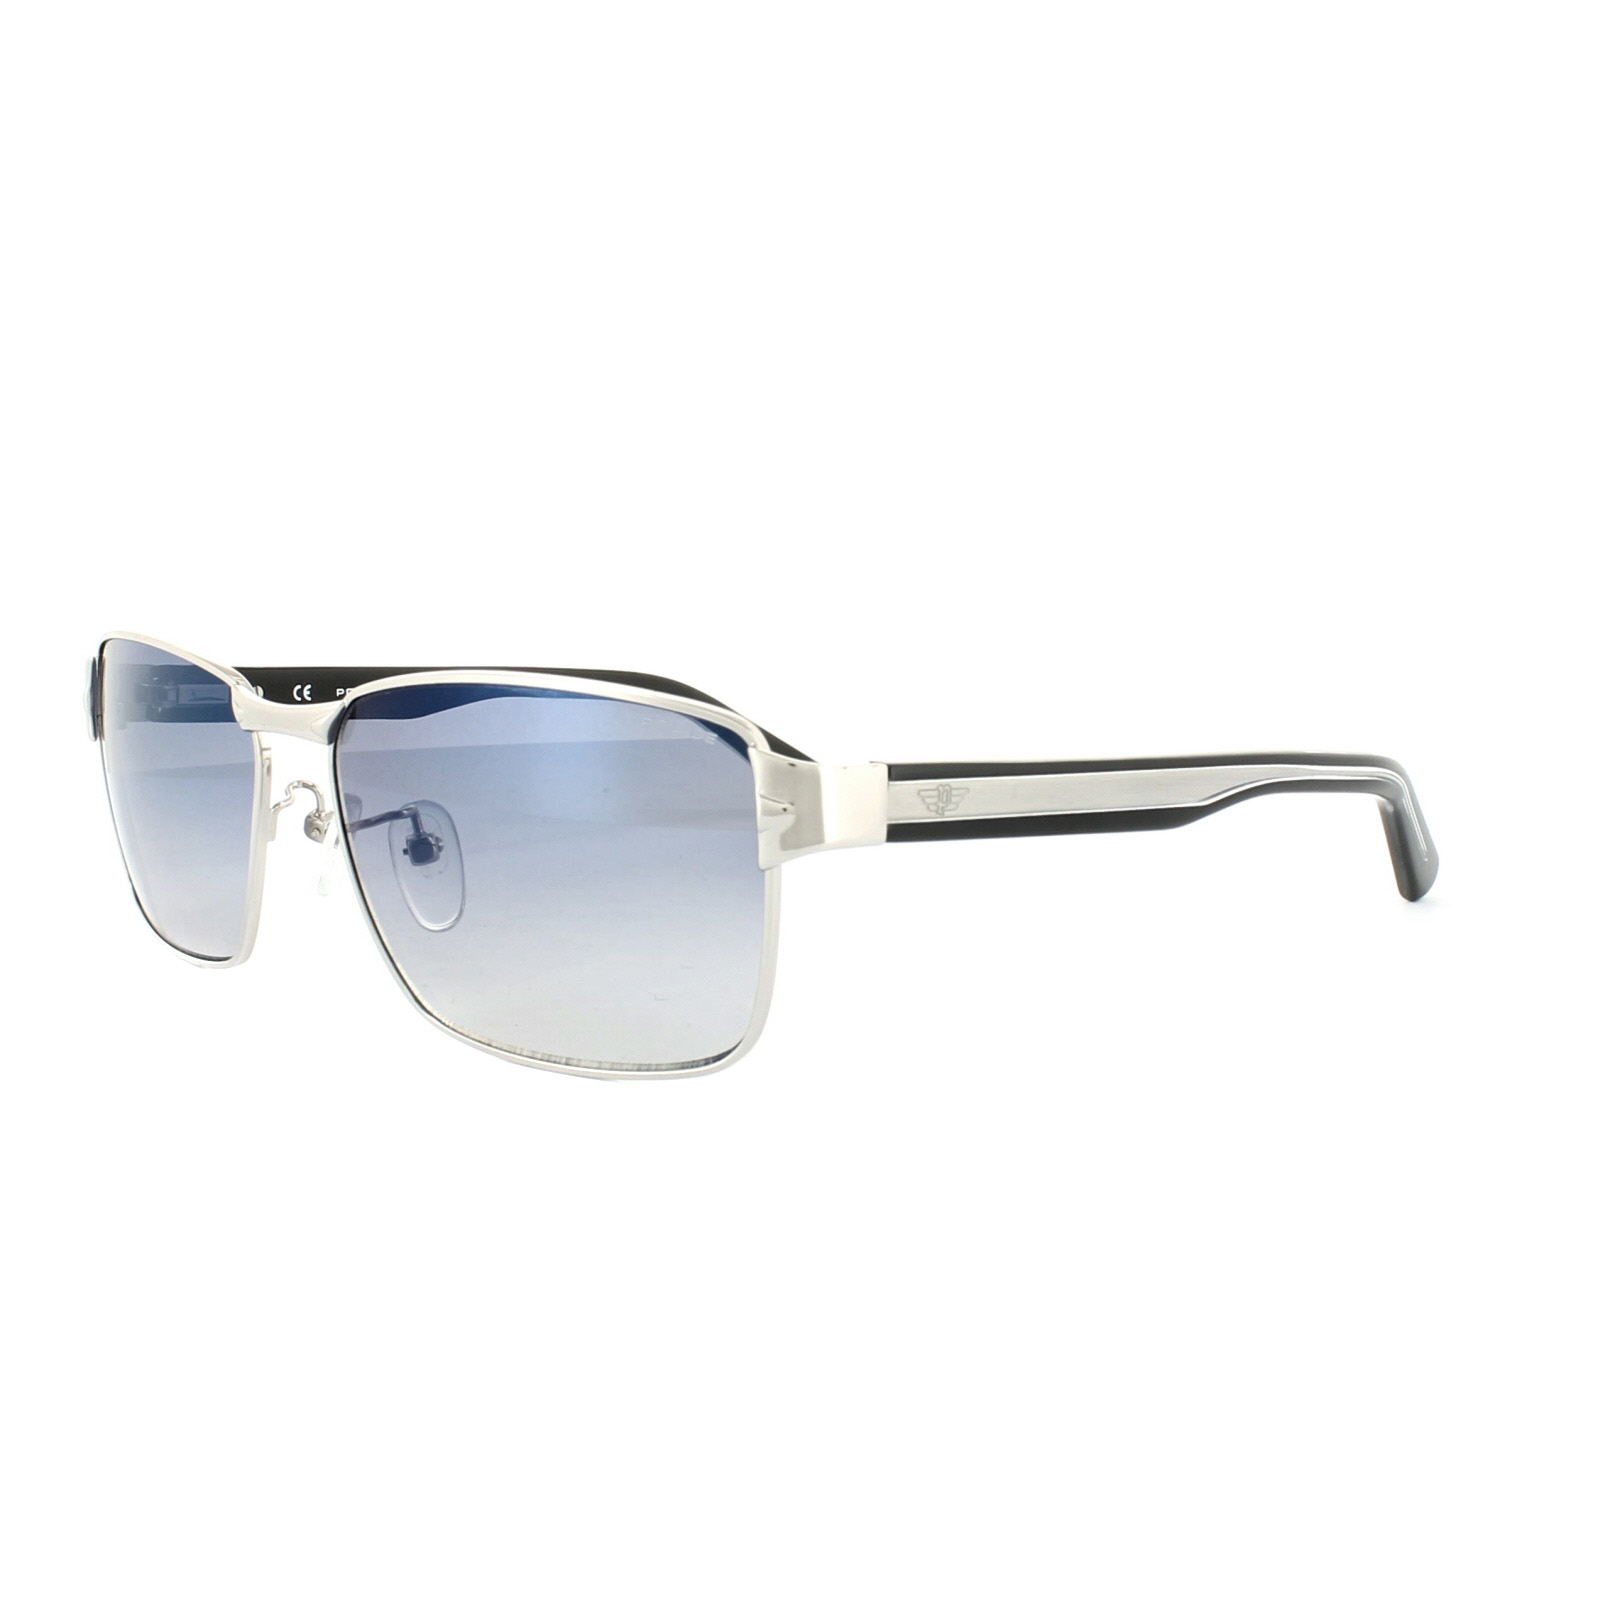 3a3faf98e1c Sentinel Police Sunglasses S8850 Glider 1 579B Ruthenium Black Blue Mirror.  Sentinel Thumbnail 2